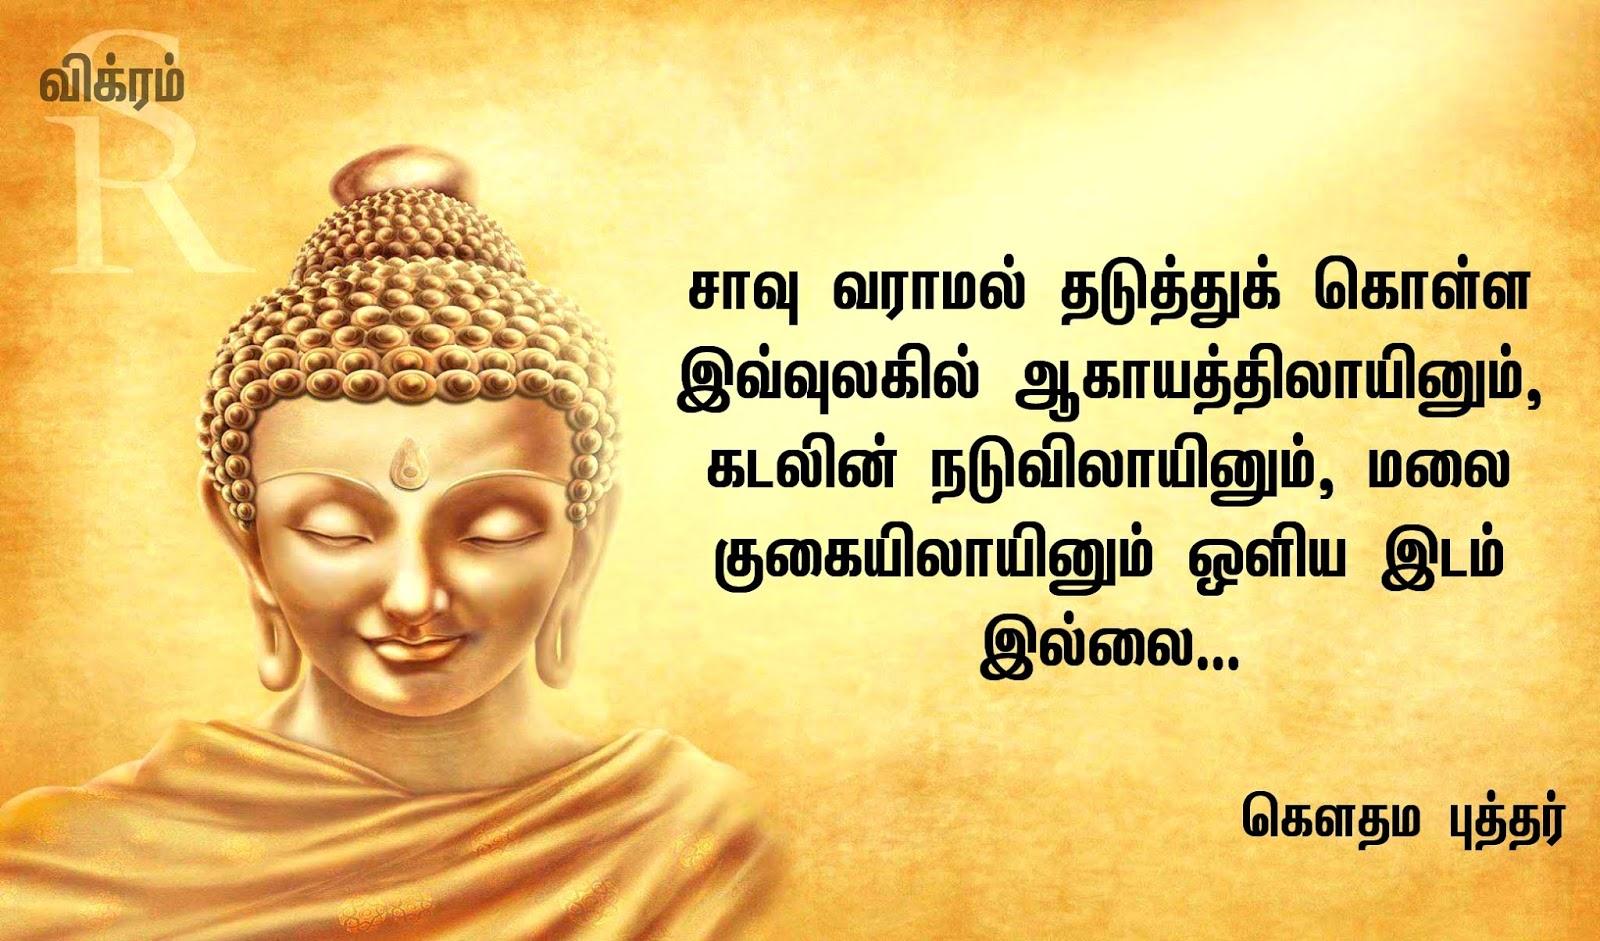 Gautam Buddha Quote Tamil